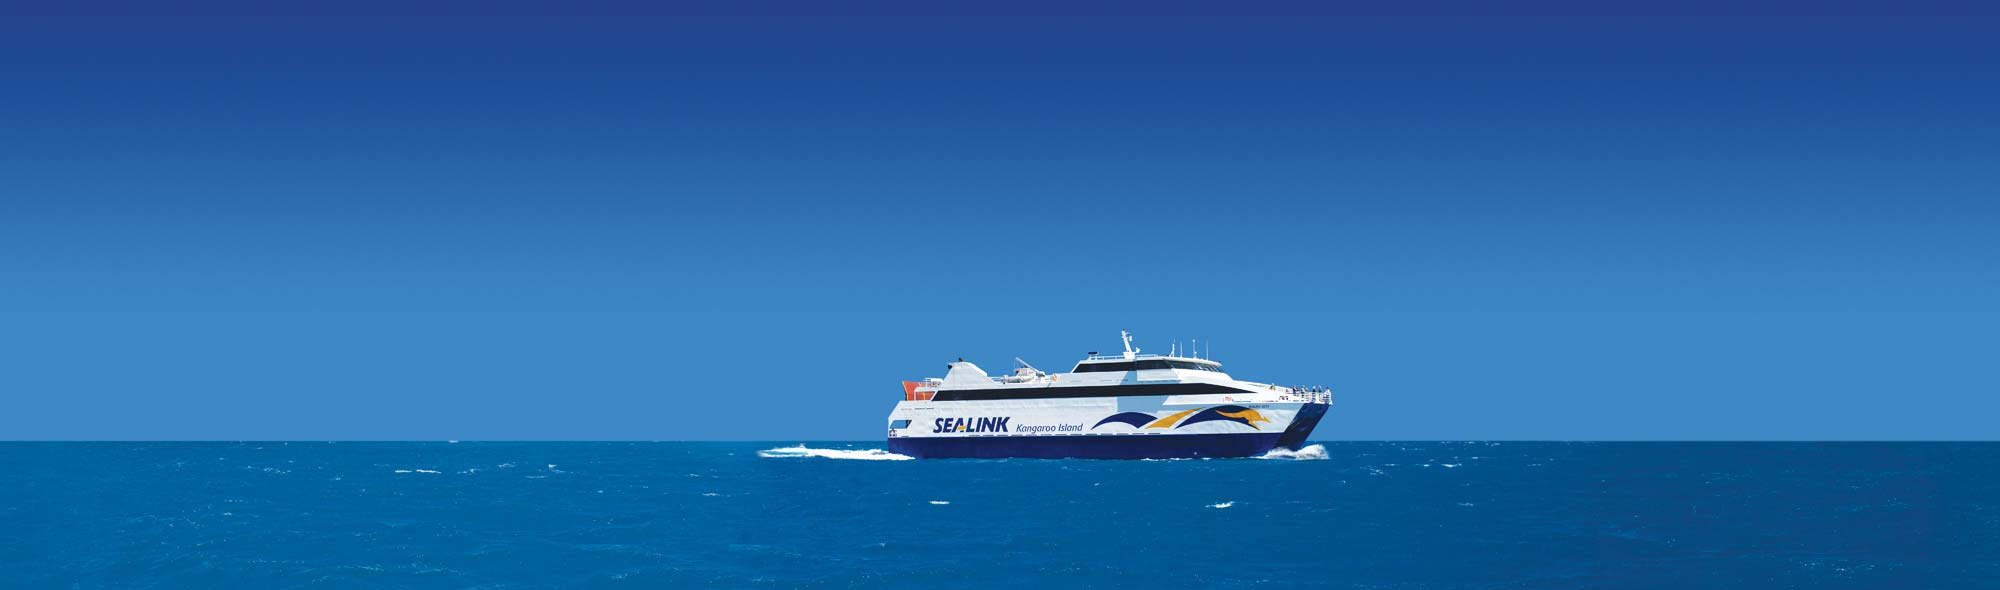 Sealink Ferry Timetable Kangaroo Island